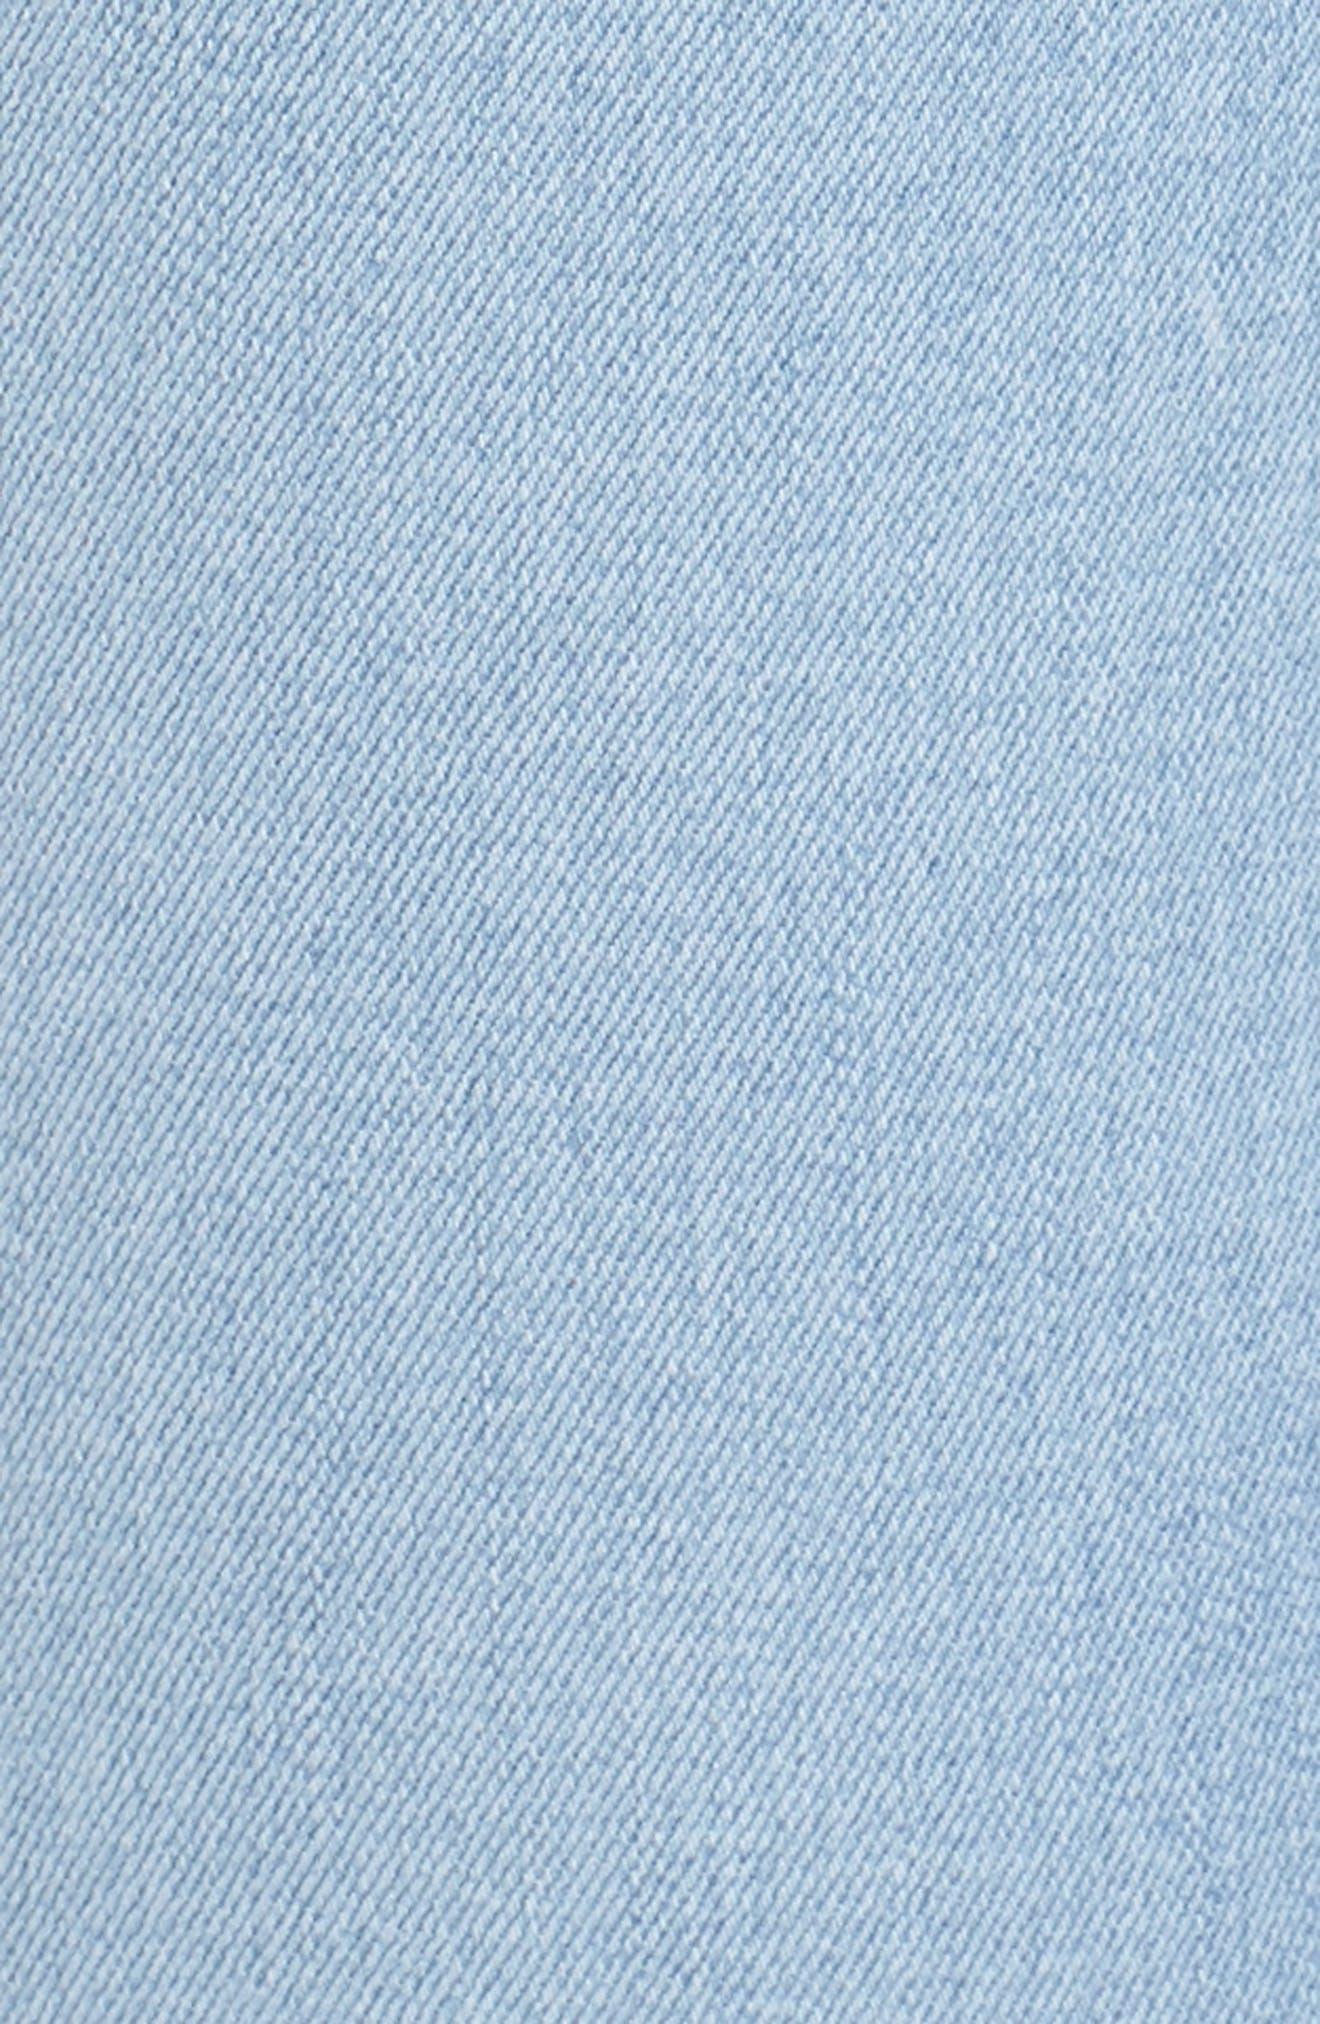 Release Hem Skinny Jeans,                             Alternate thumbnail 6, color,                             432